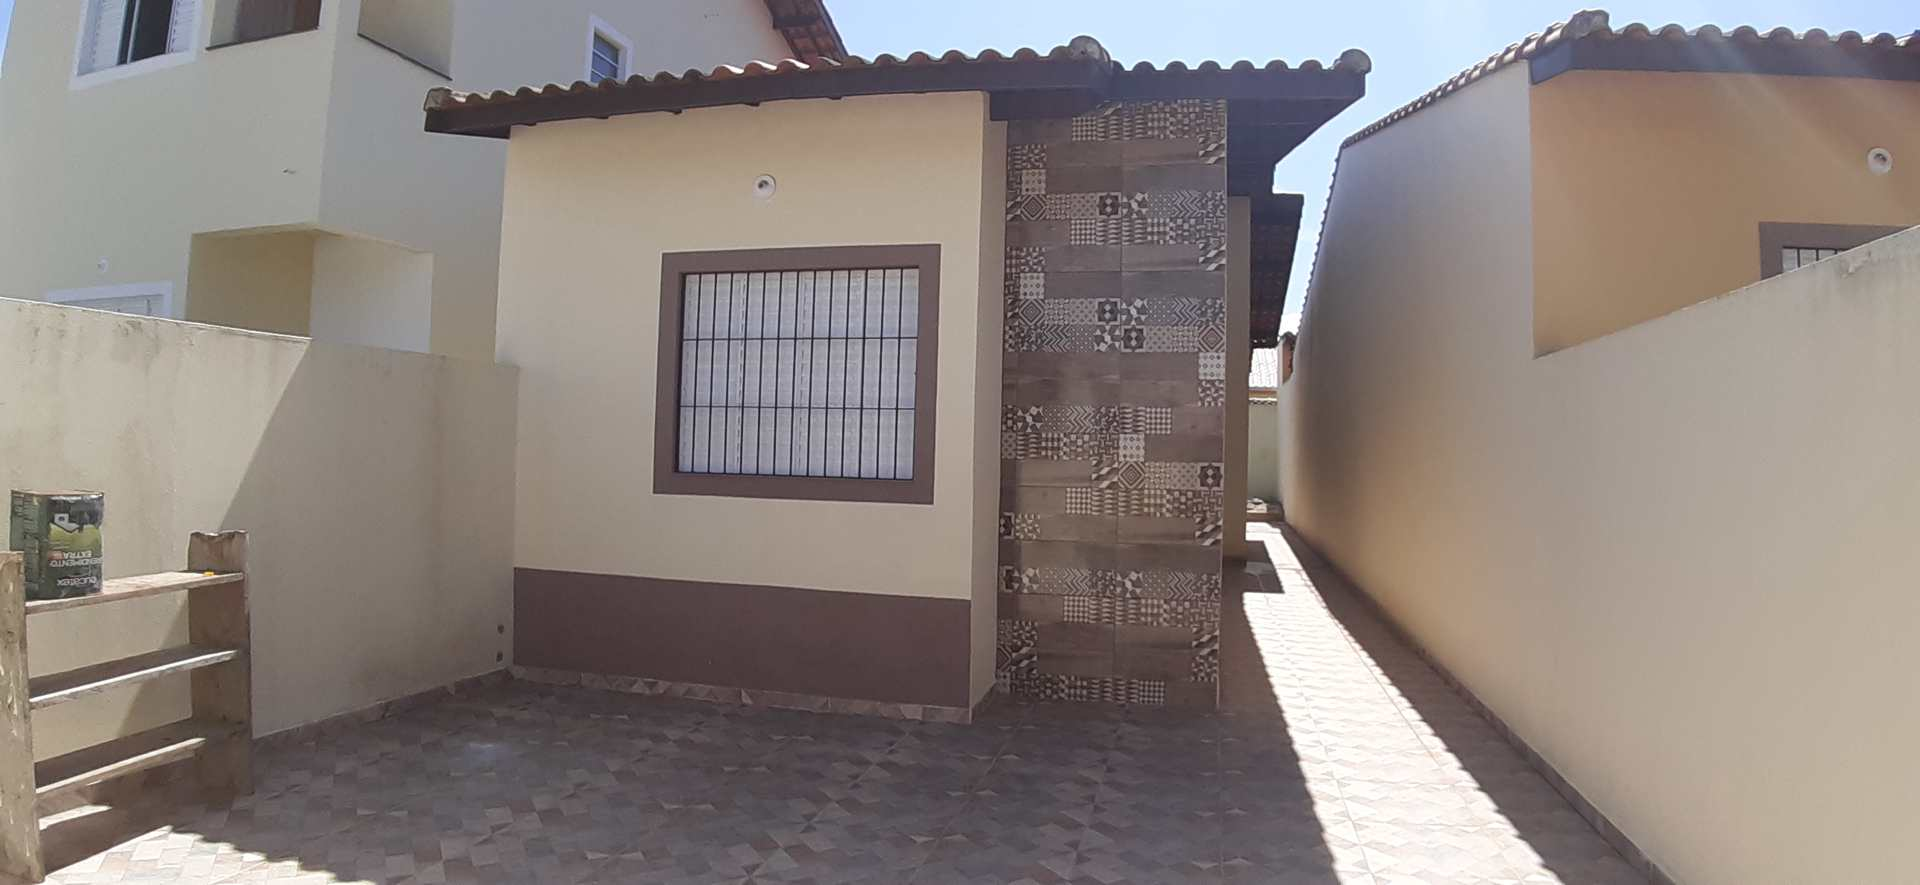 Casa com 3 dorms, Jardim Bopiranga, Itanhaém - R$ 295 mil, Cod: 5614